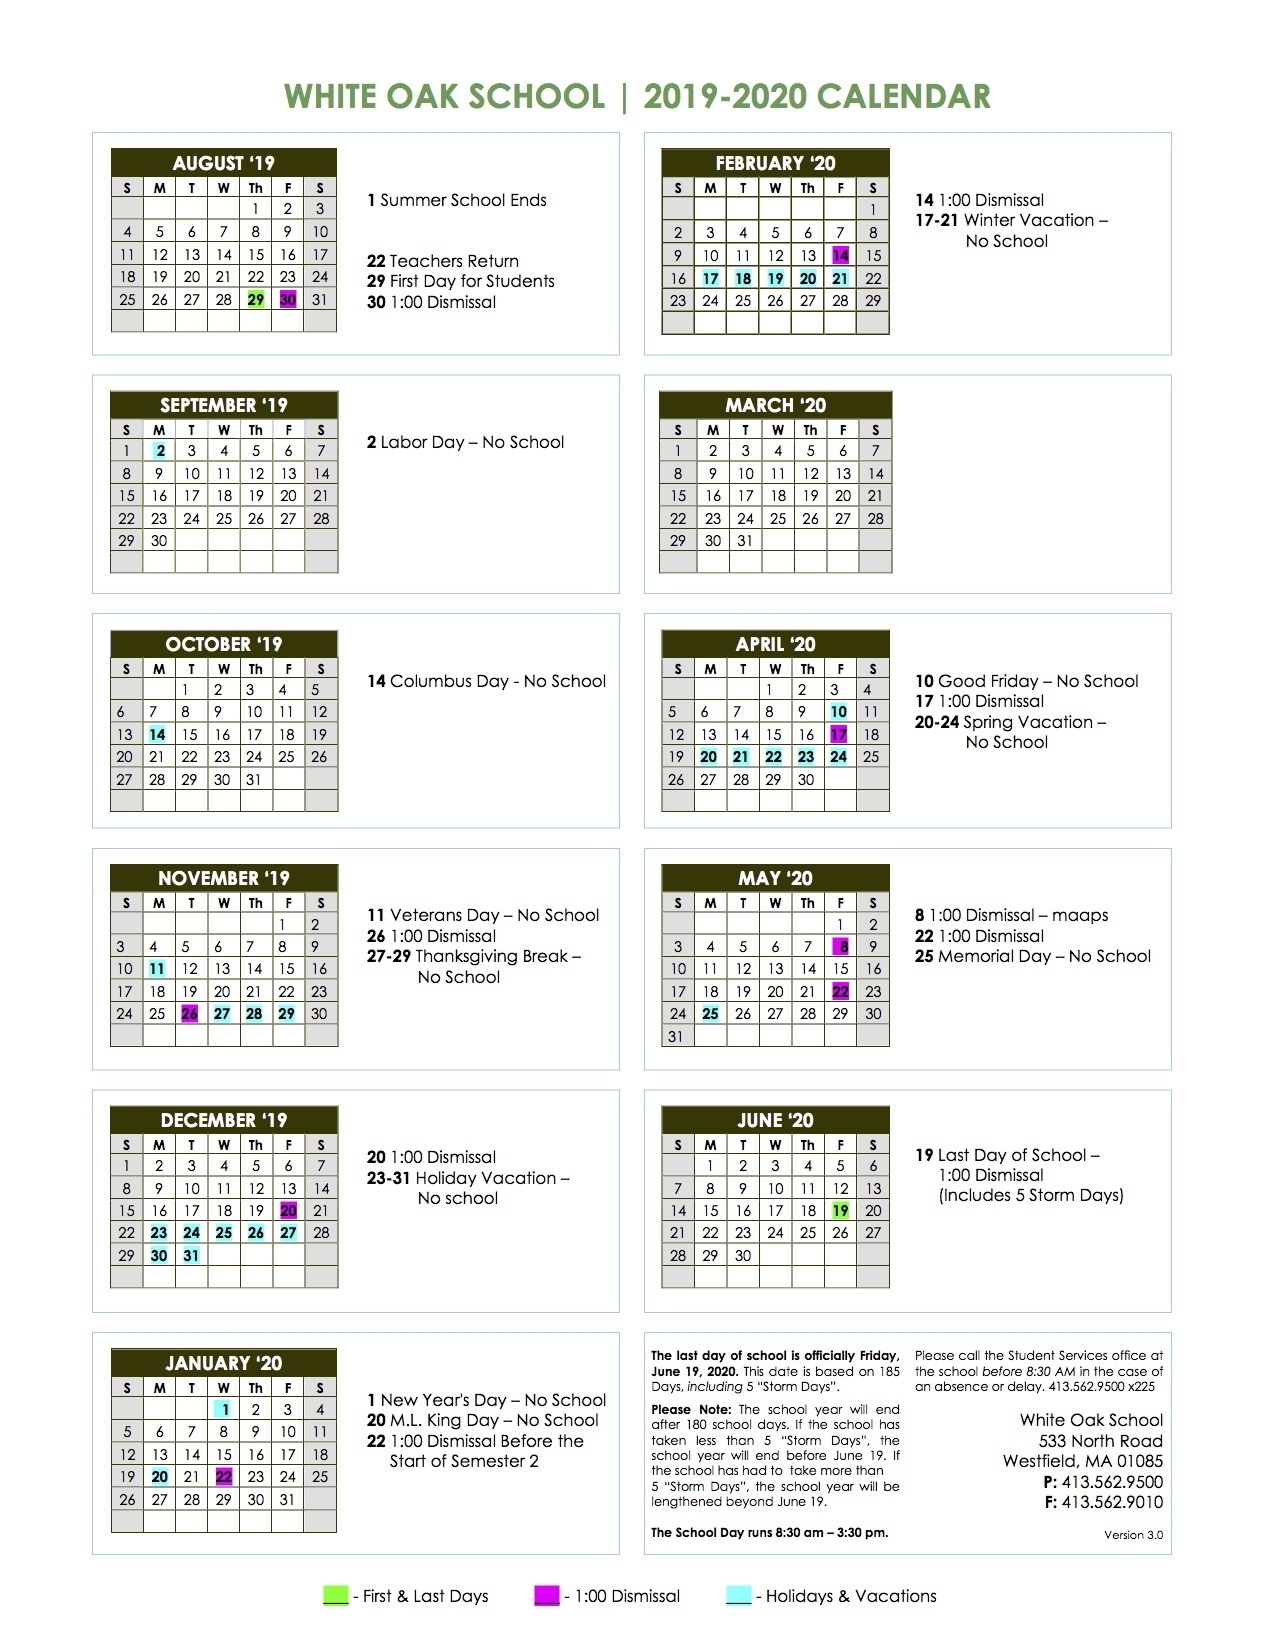 School Calendar 2019 – 2020 – White Oak School